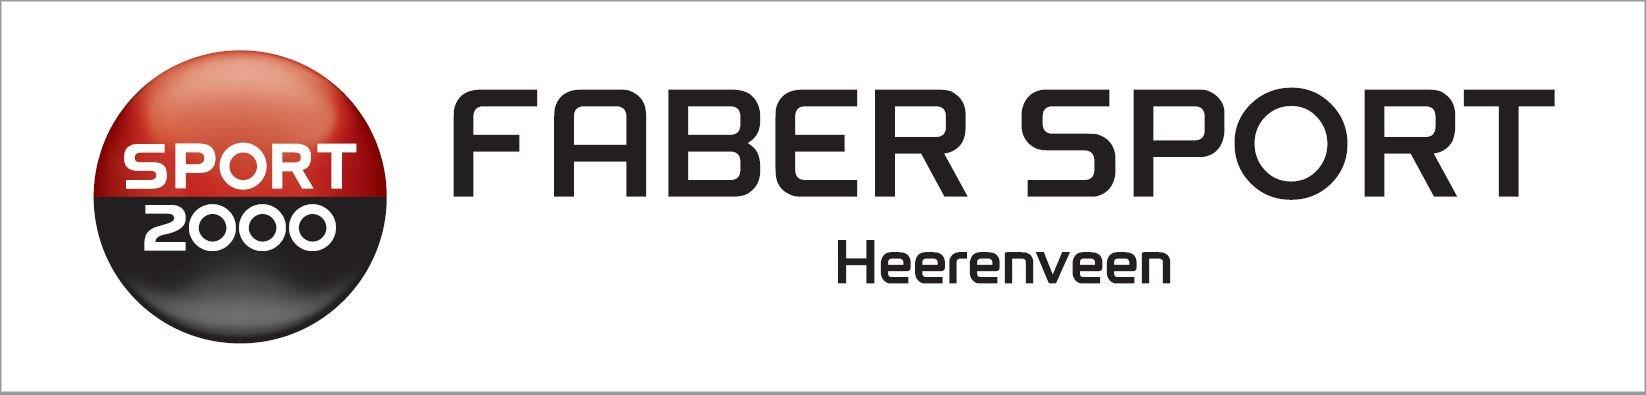 FaberSport Logo2